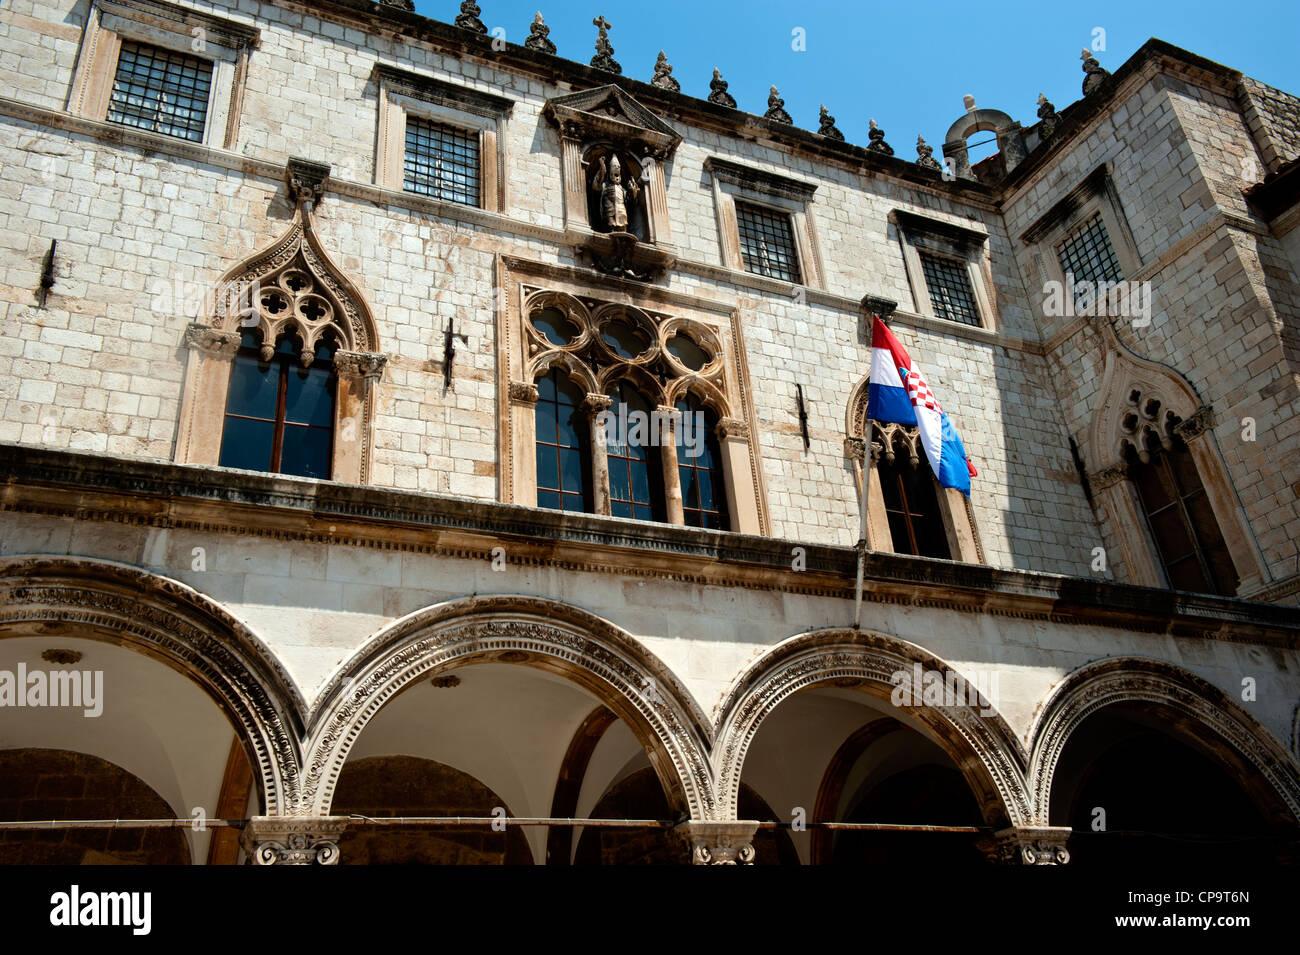 The Sponza Palace hosting the Memorial Room of Dubrovnik Defenders, boulevard Stadrun , Old Town, Dubrovnik. Croatia. - Stock Image